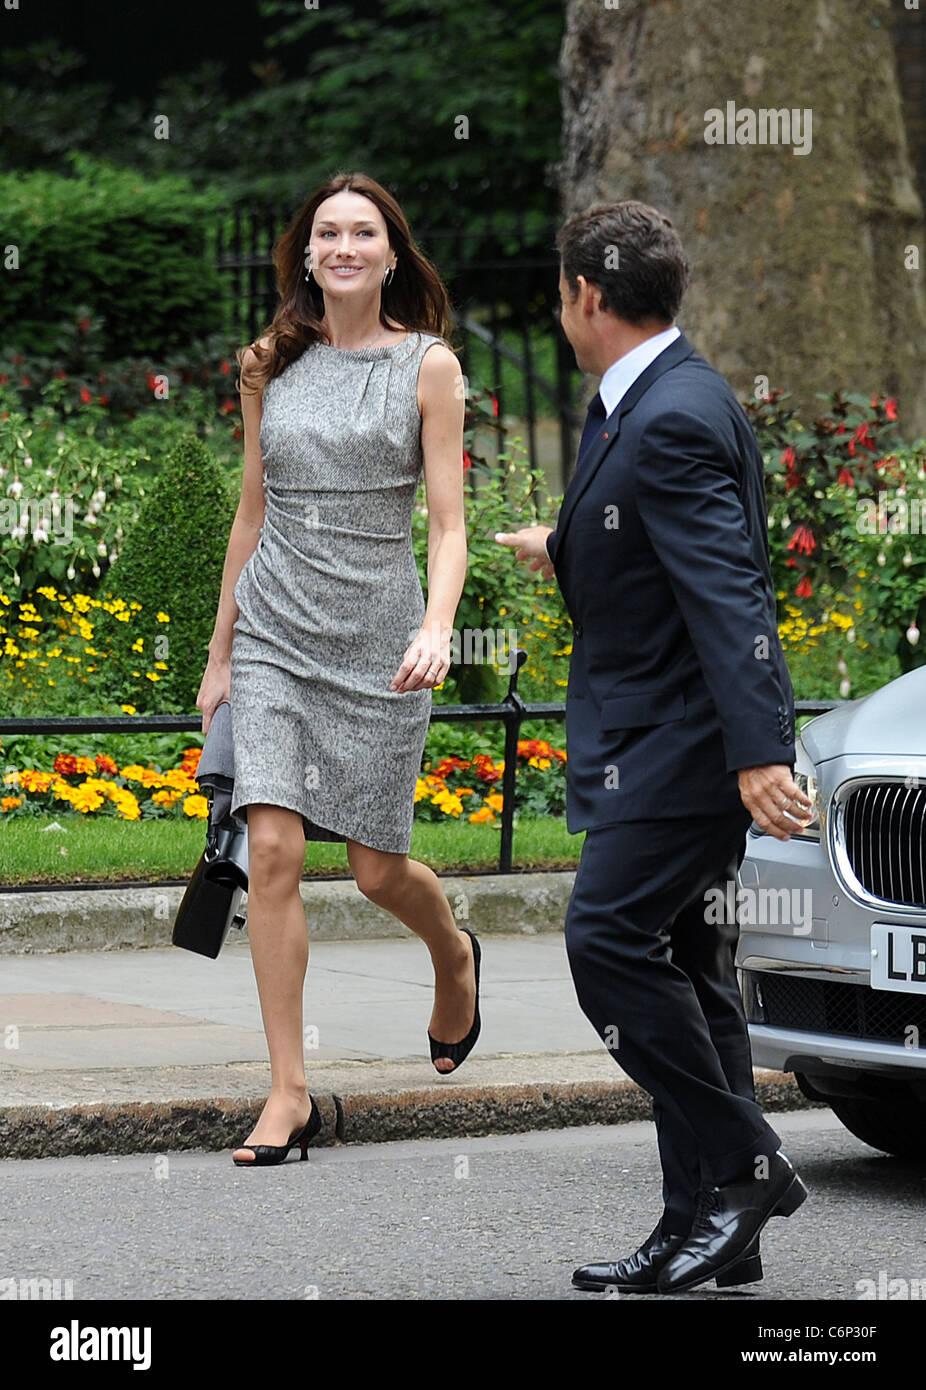 French President Nicolas Sarkozy And His Wife Carla Bruni Sarkozy Stock Photo Alamy